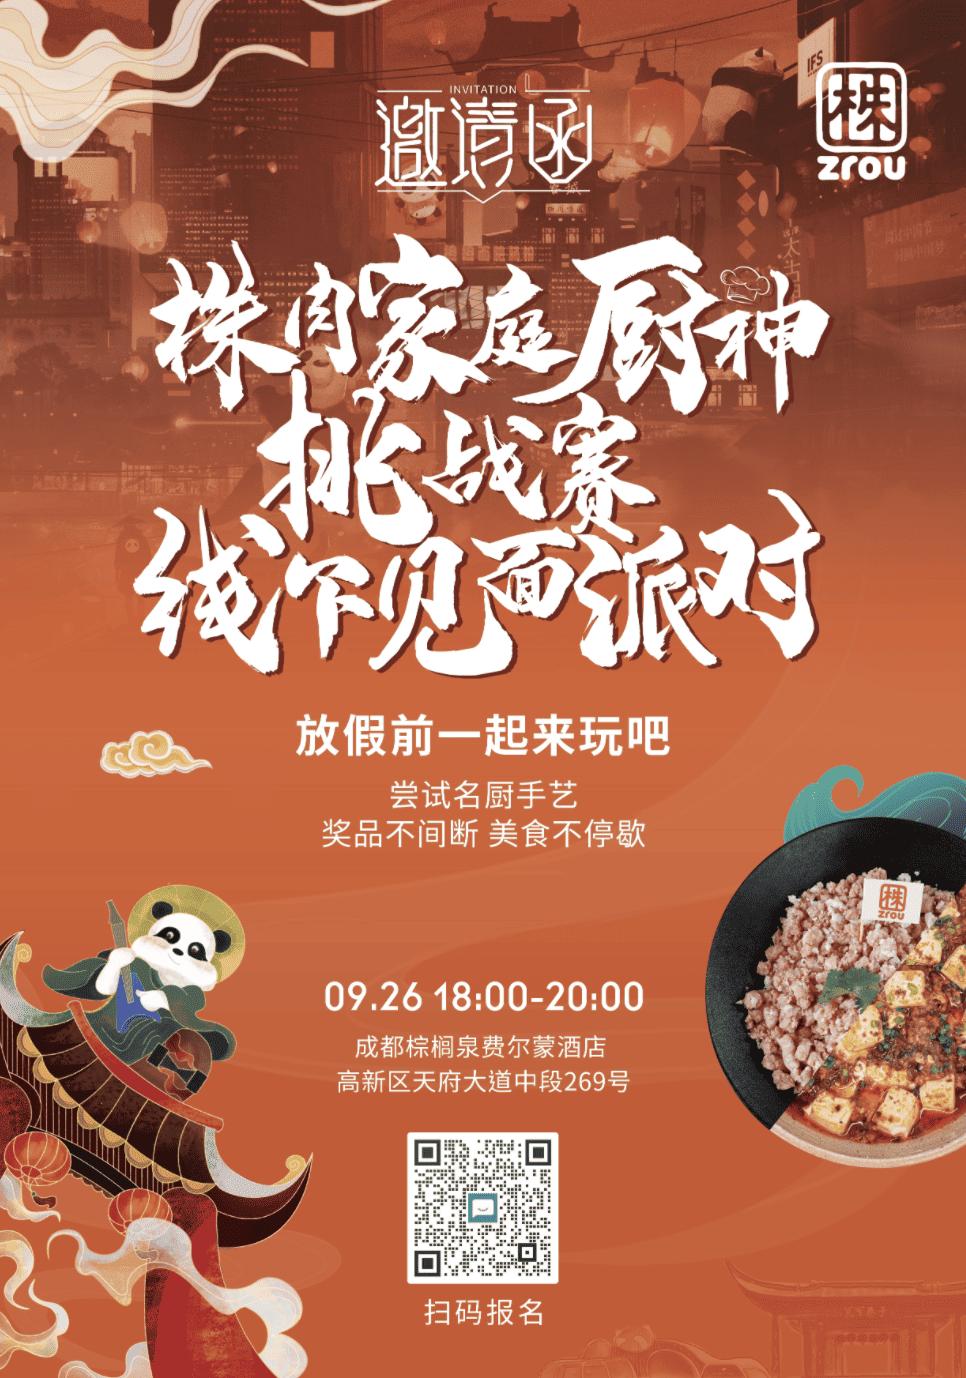 Zrou event Chengdu chengdu expat 1